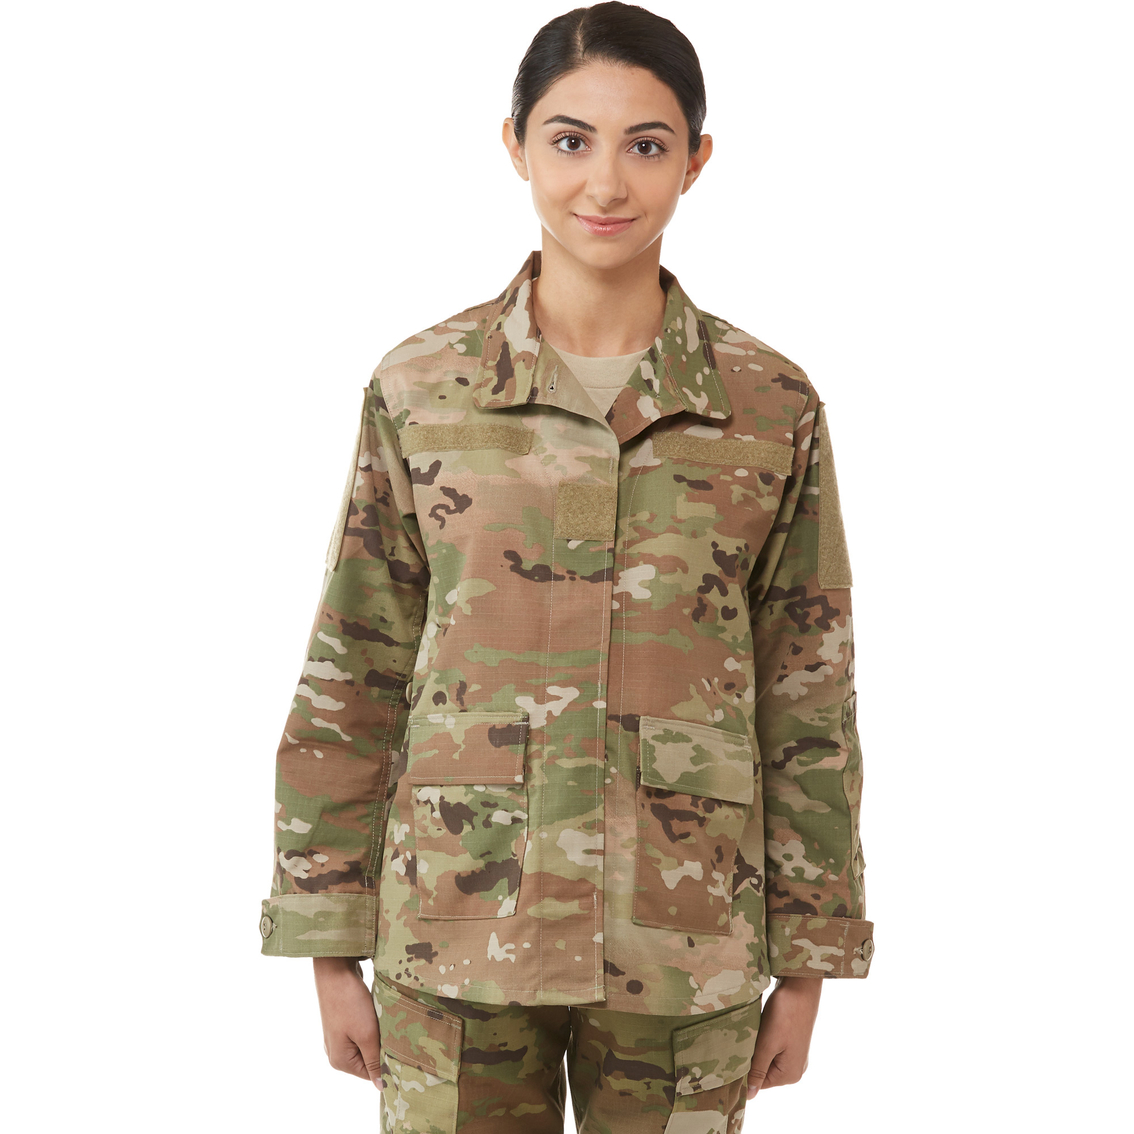 Maternity Coat Ocp Maternity Uniforms Military Shop The Exchange